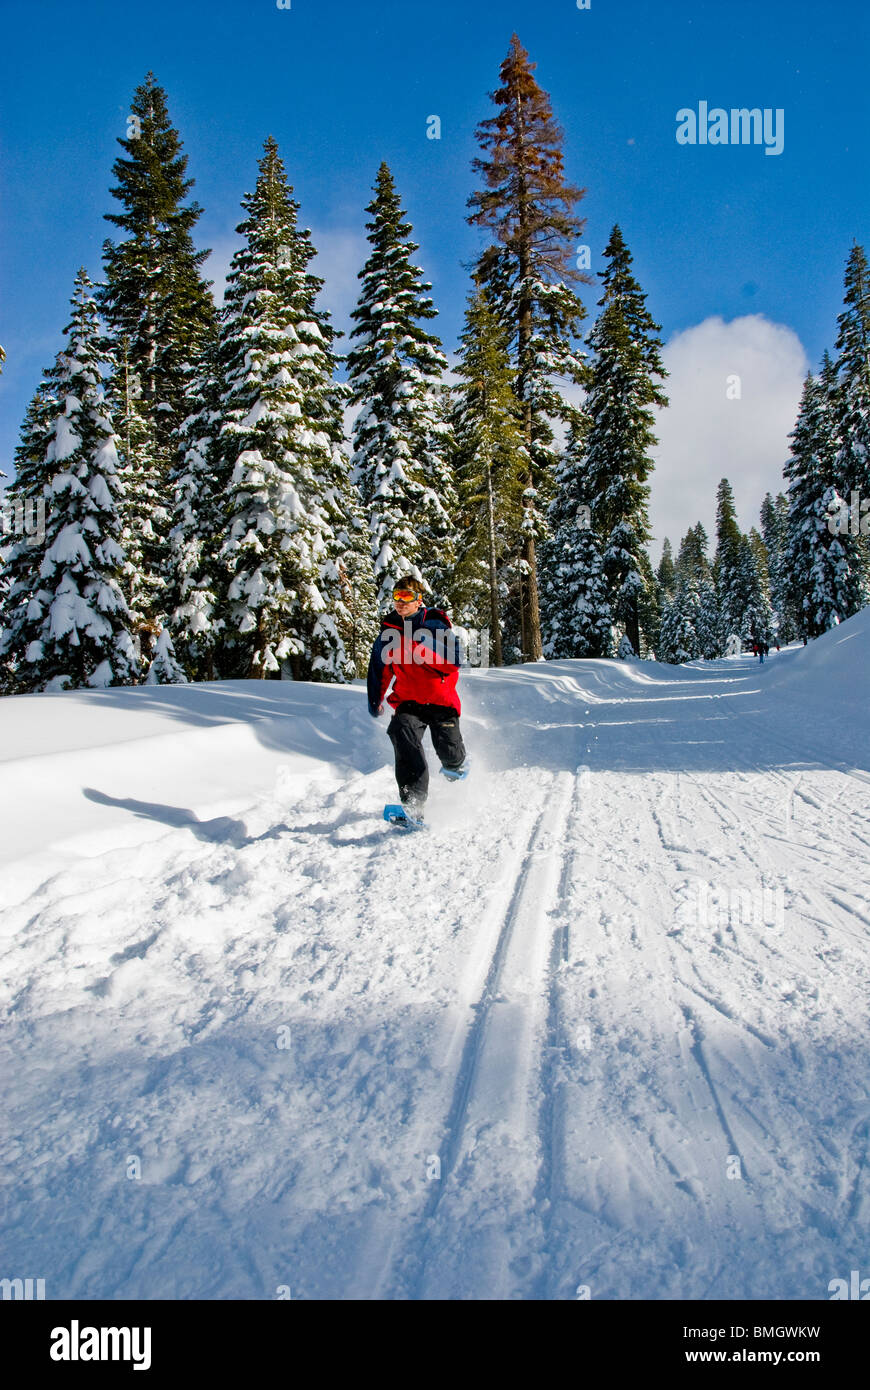 snowshoes, running, racing, sport, Winter scene, North Lake Tahoe, California, USA Stock Photo